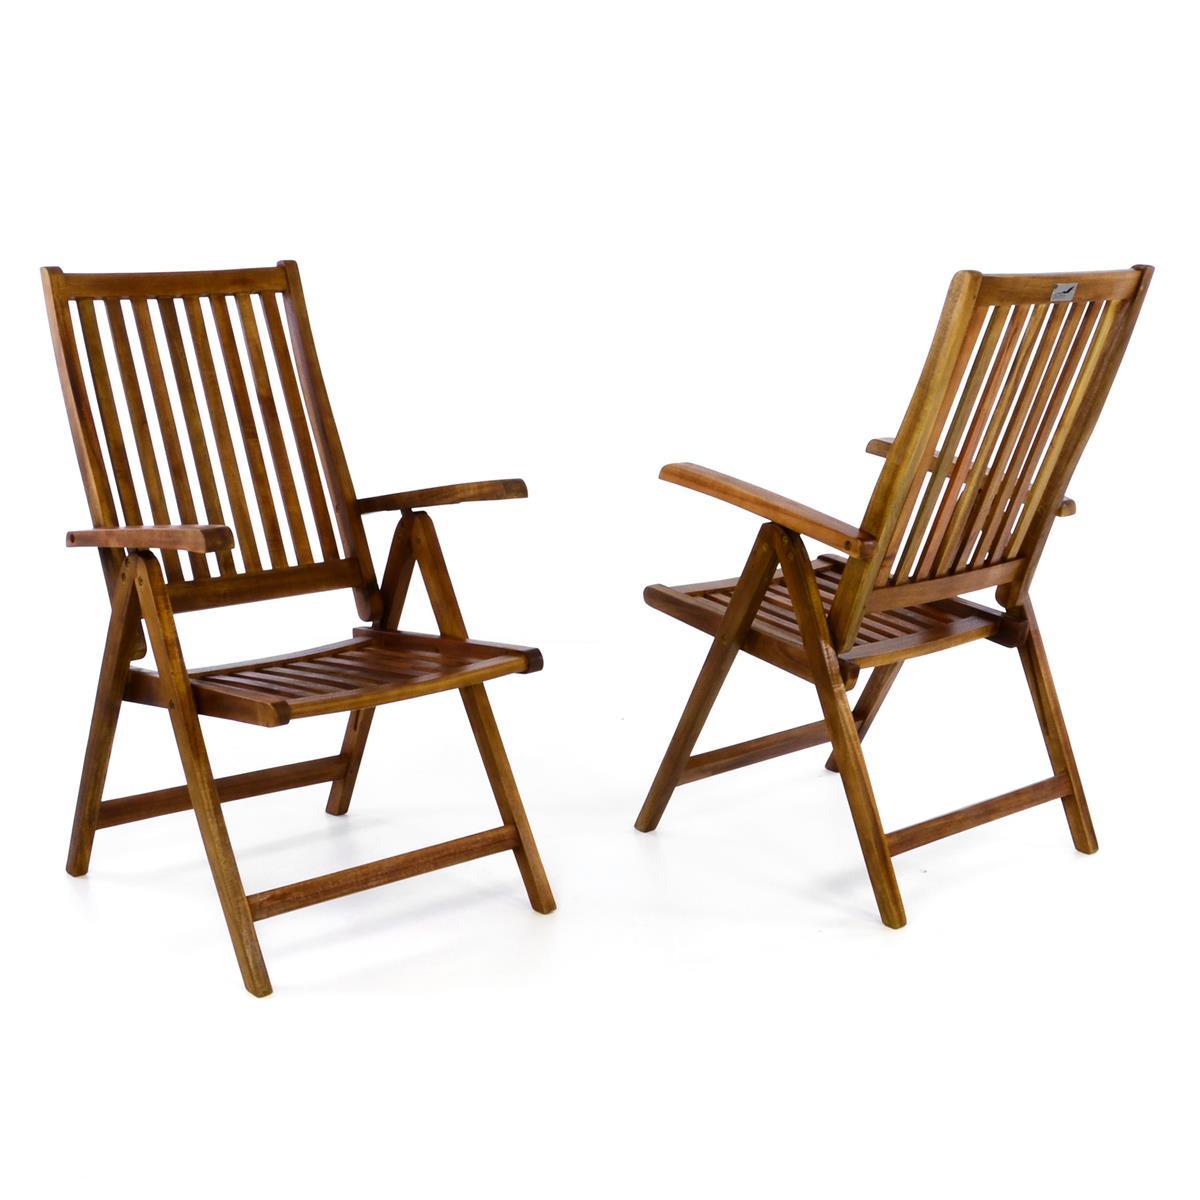 DIVERO 2er Set Gartenstuhl Hochlehner Klappstuhl Stuhl Akazie Holz behandelt